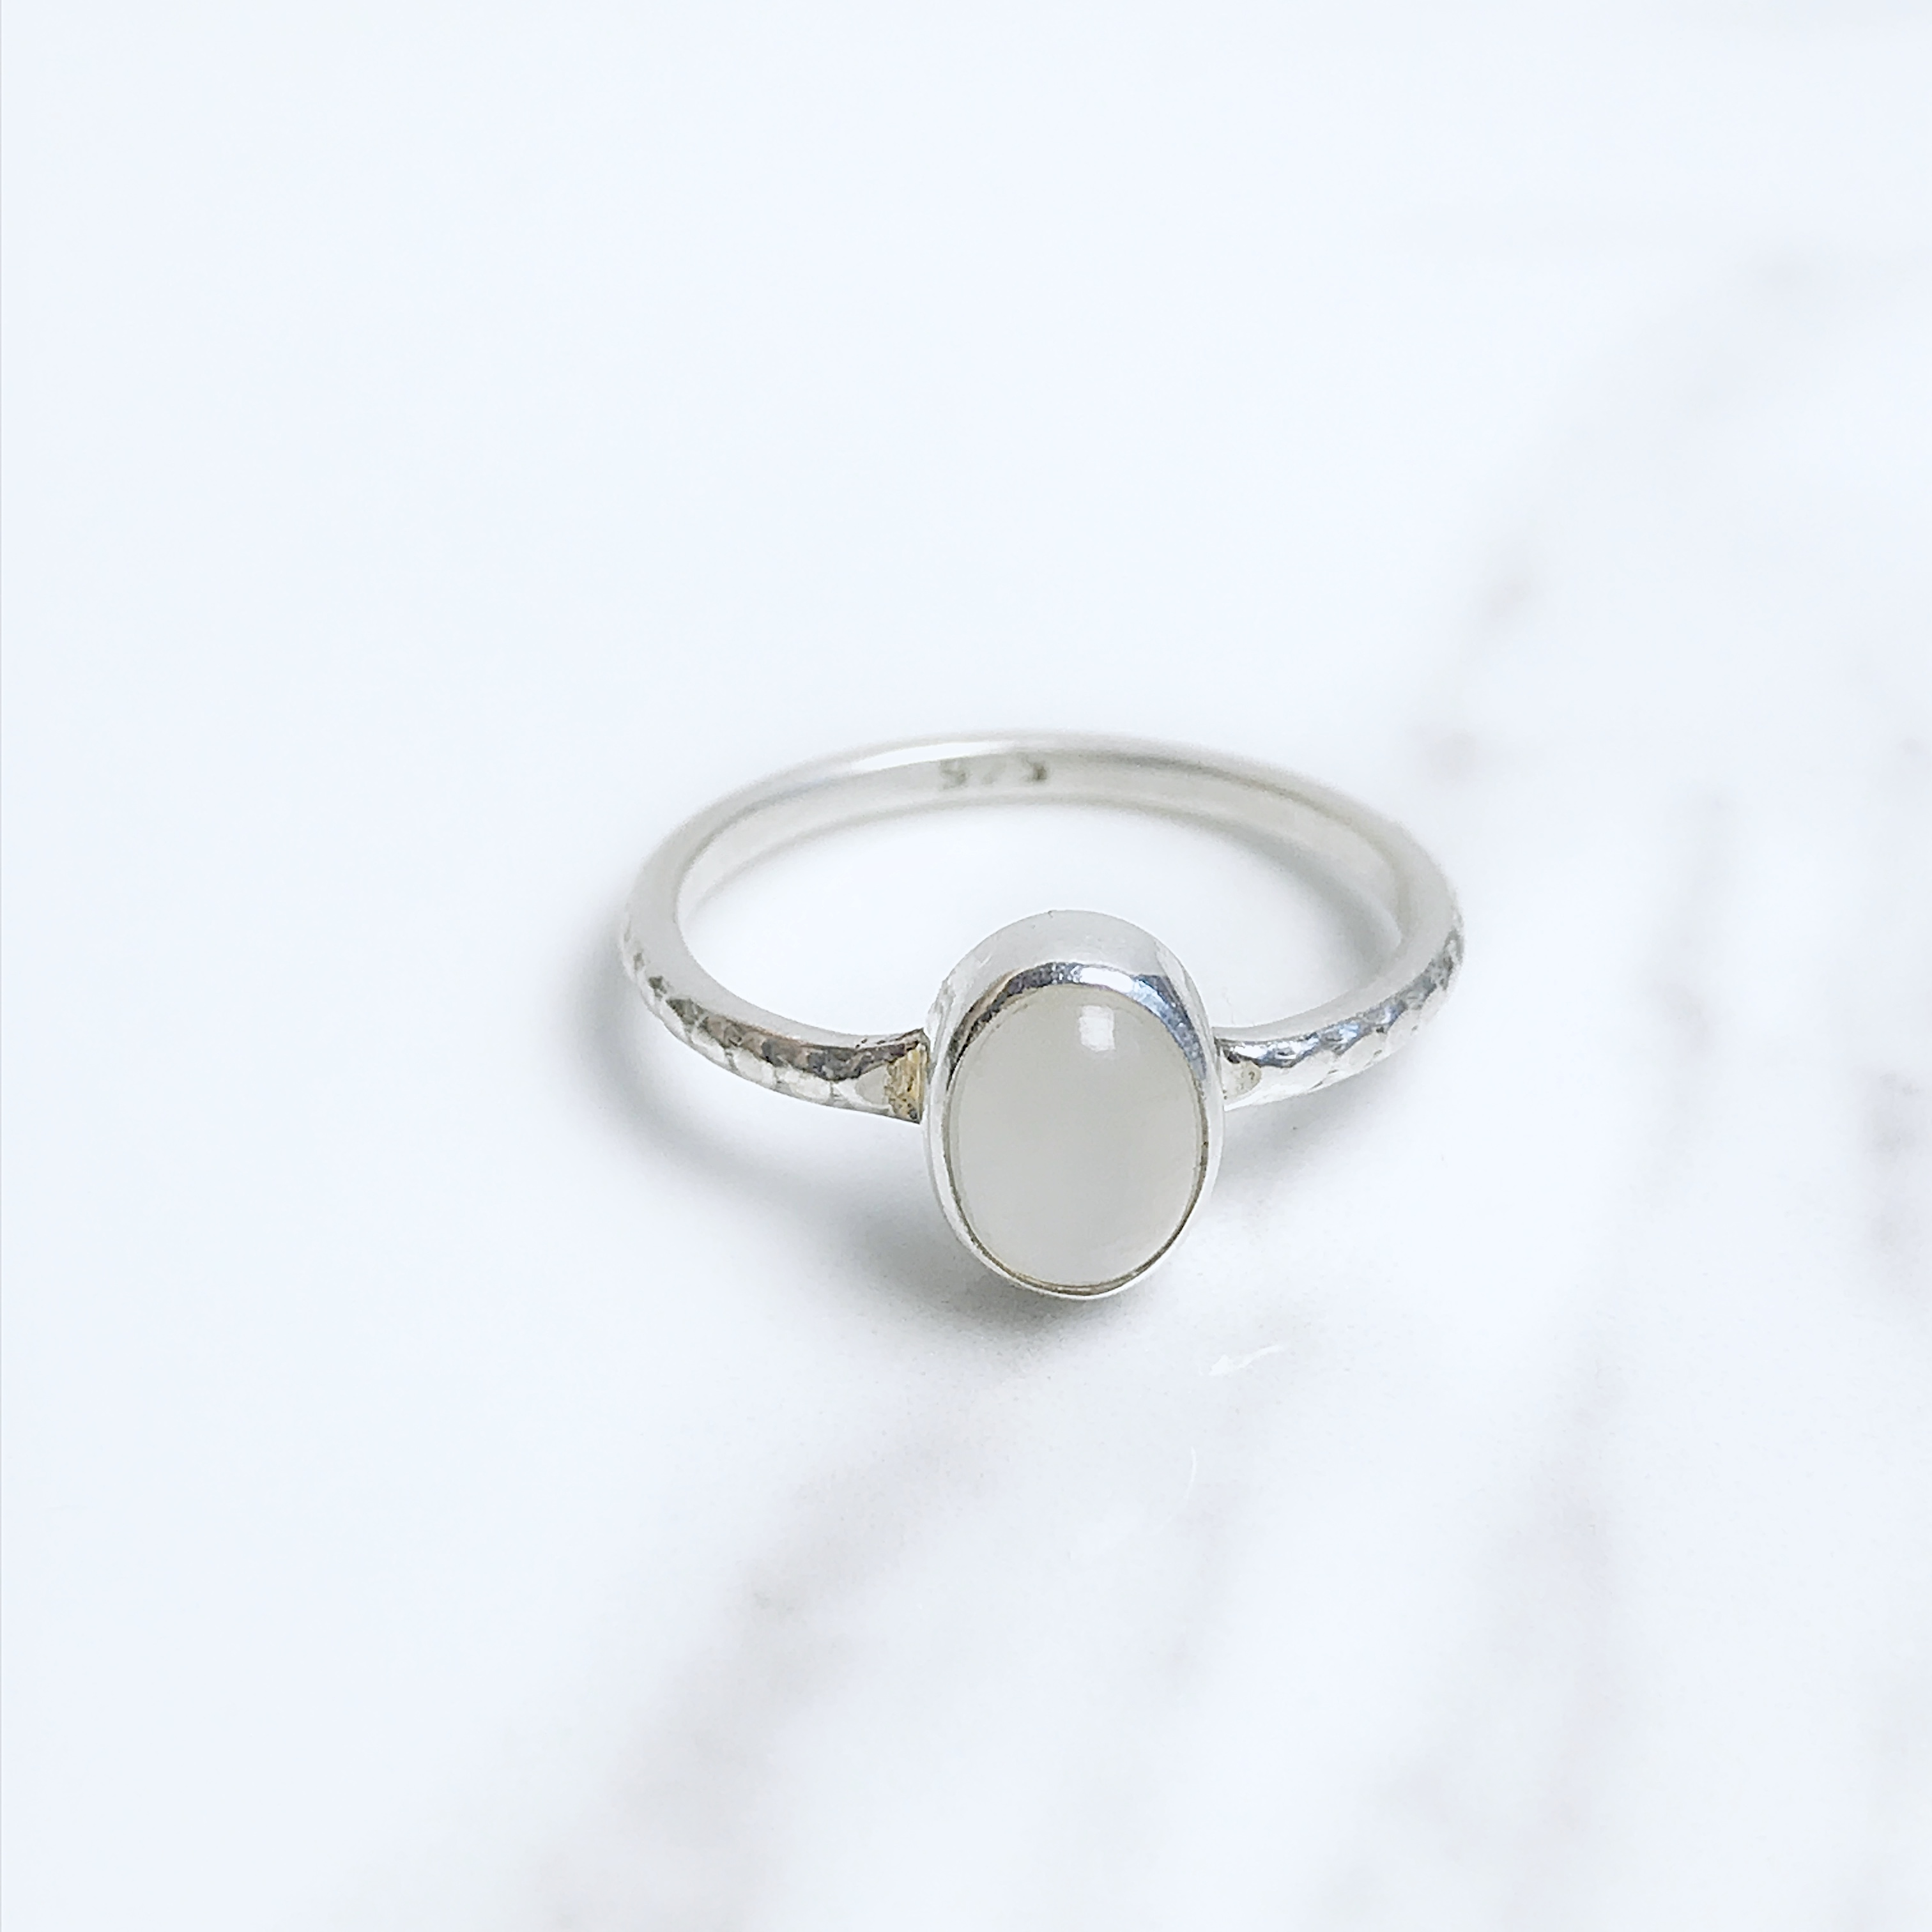 Luna Drop Anneau COSMIC bijoux Argent Sterling Pierre De Lune Bague pierre Gemstone